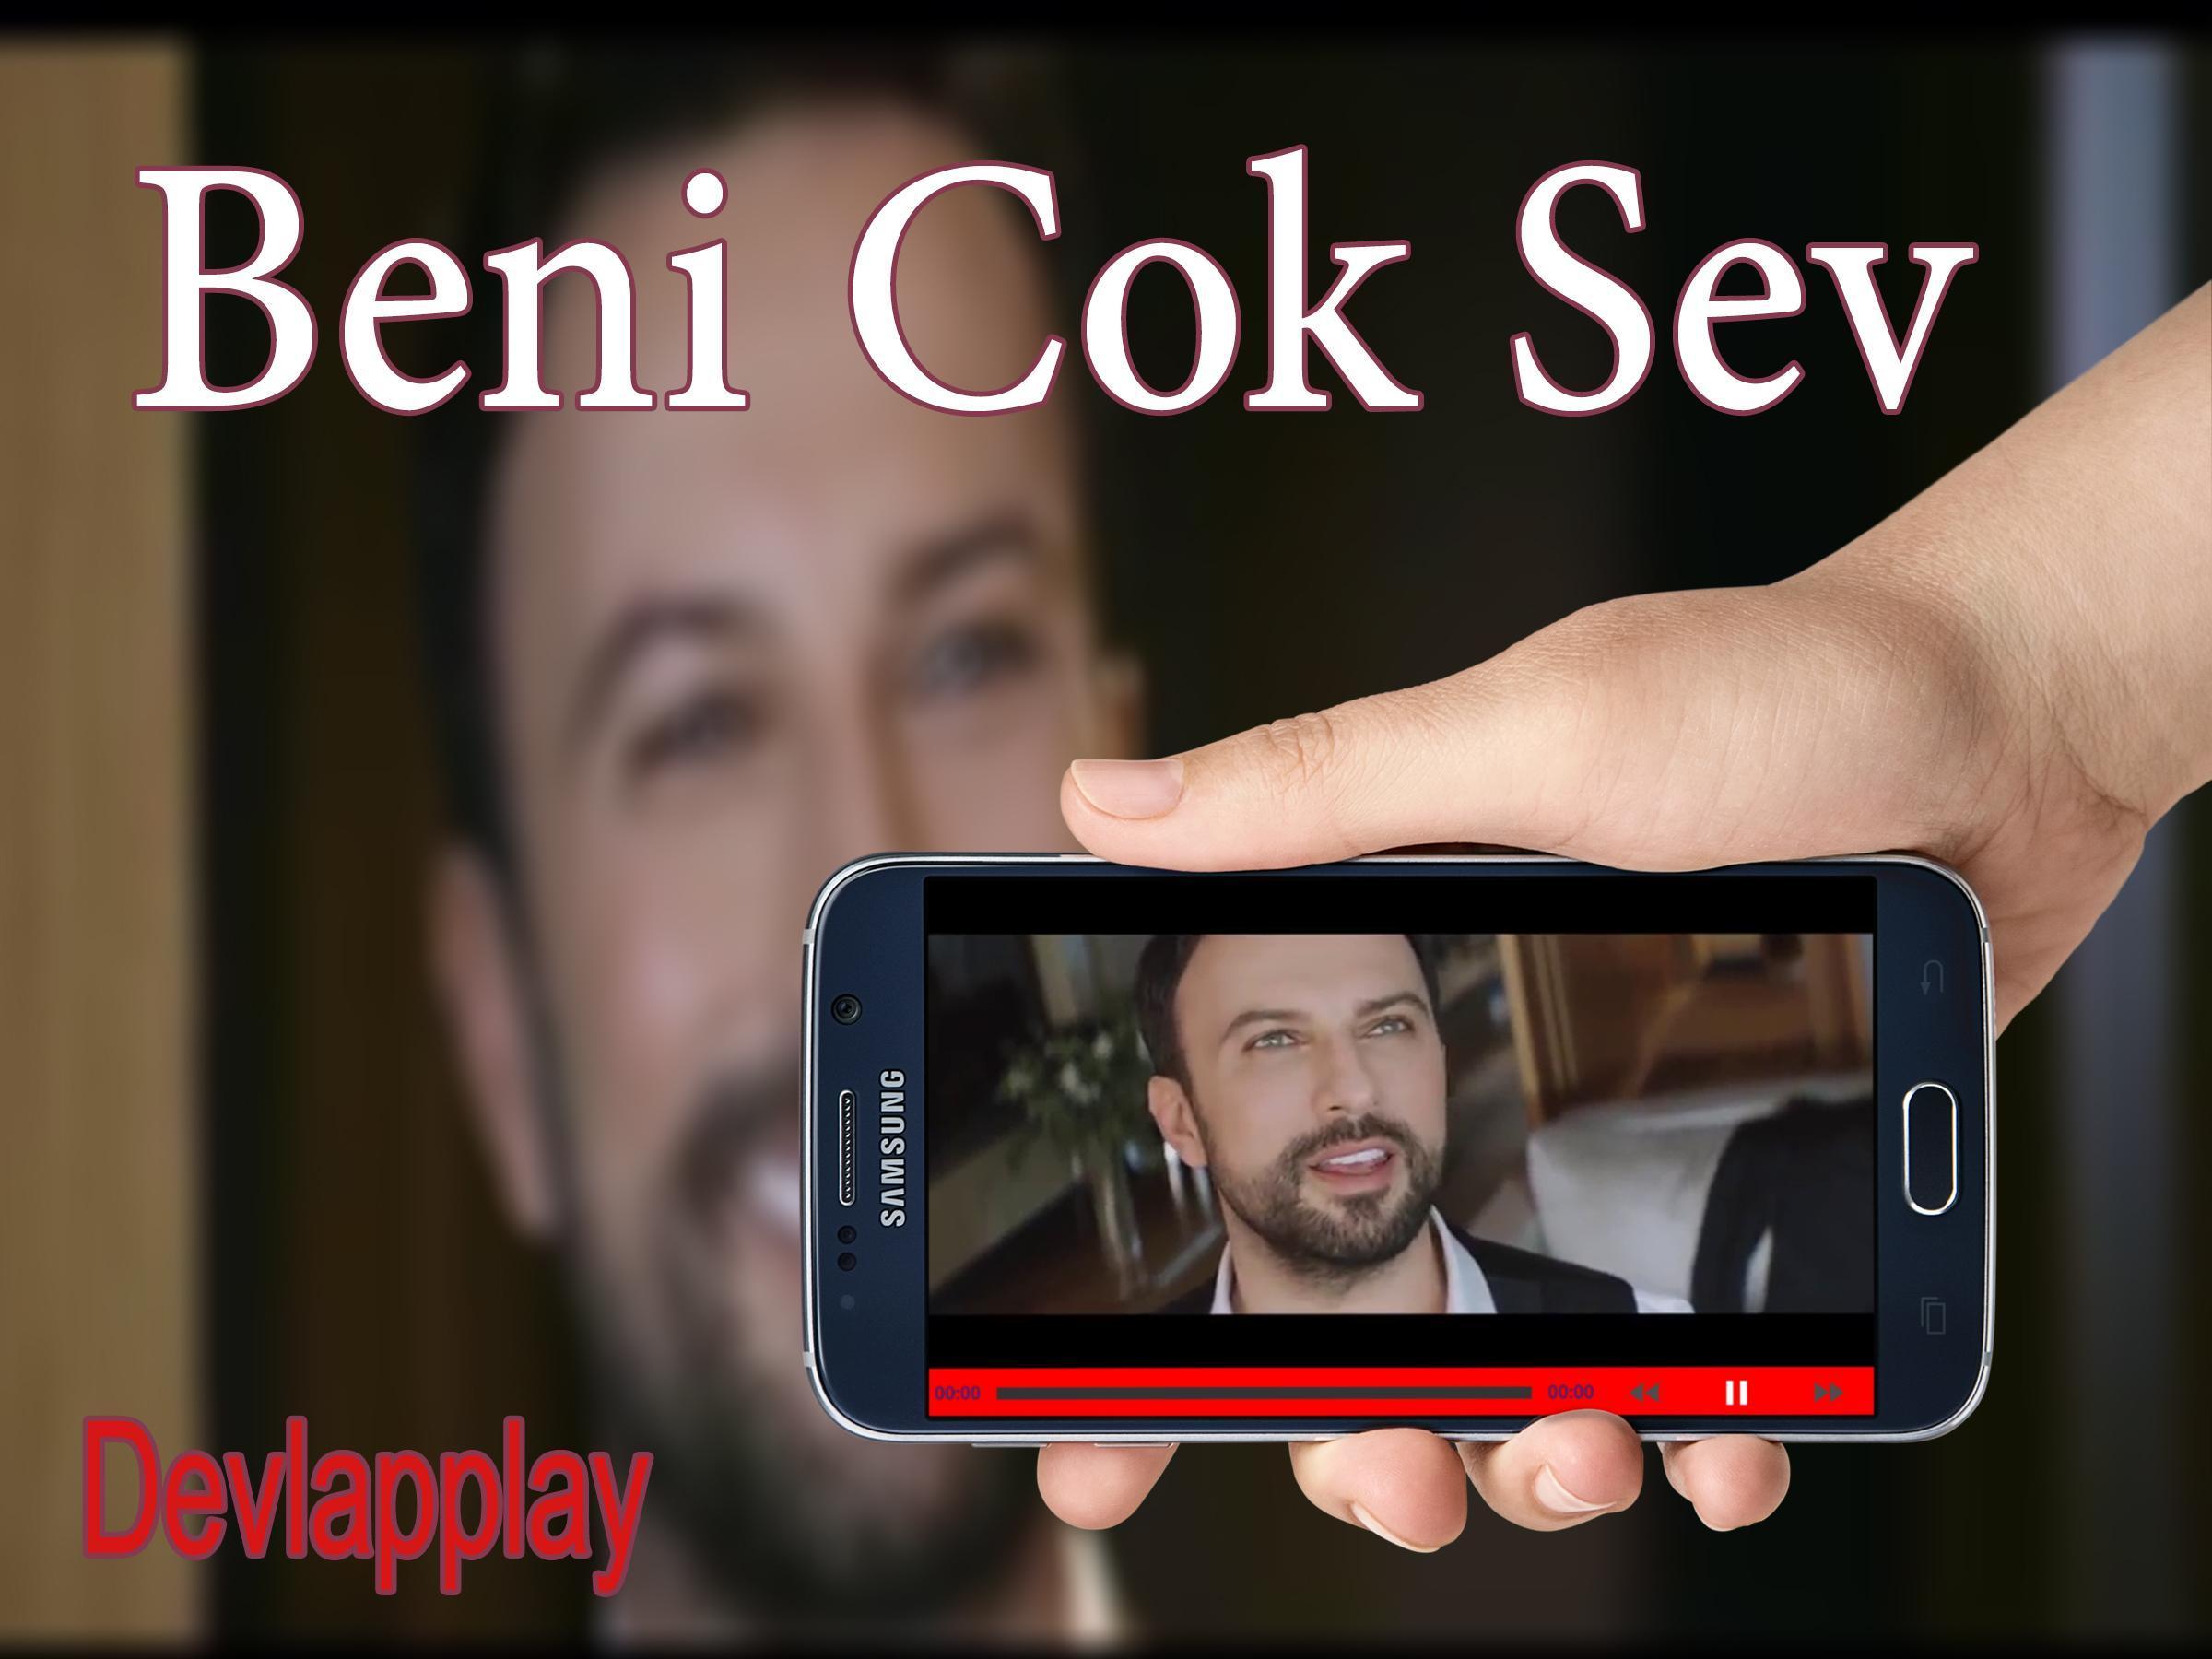 Tarkan Beni Cok Sev For Android Apk Download